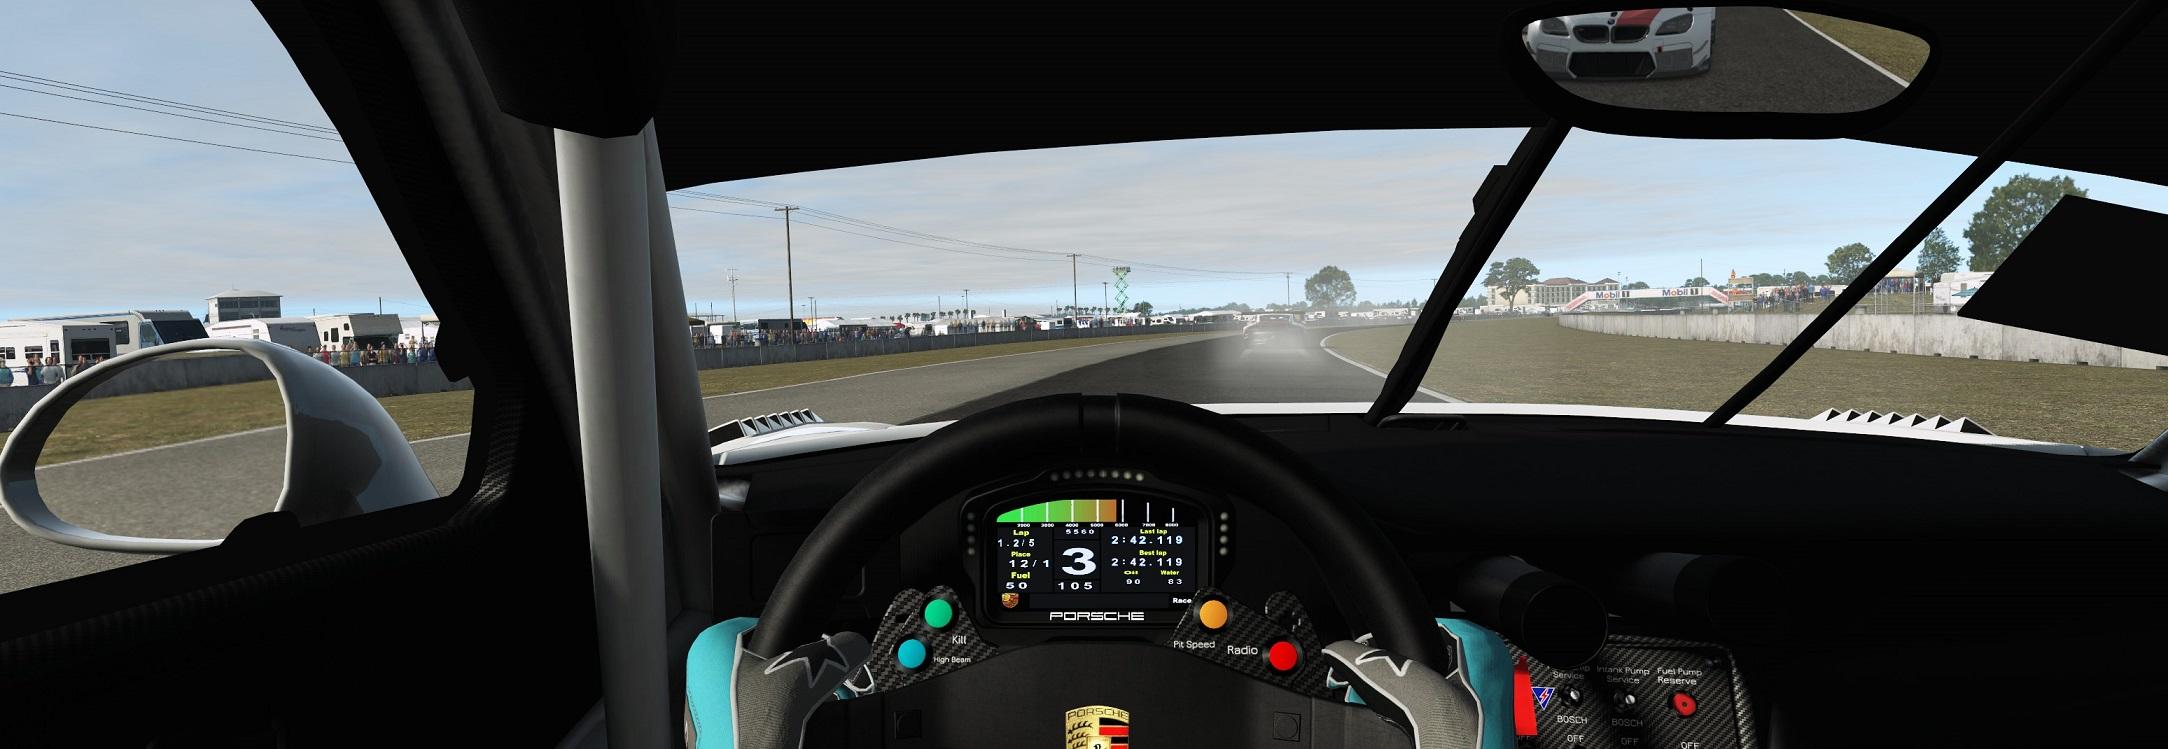 4 PORSCHE 911 GT3 R COCKPIT copy.jpg